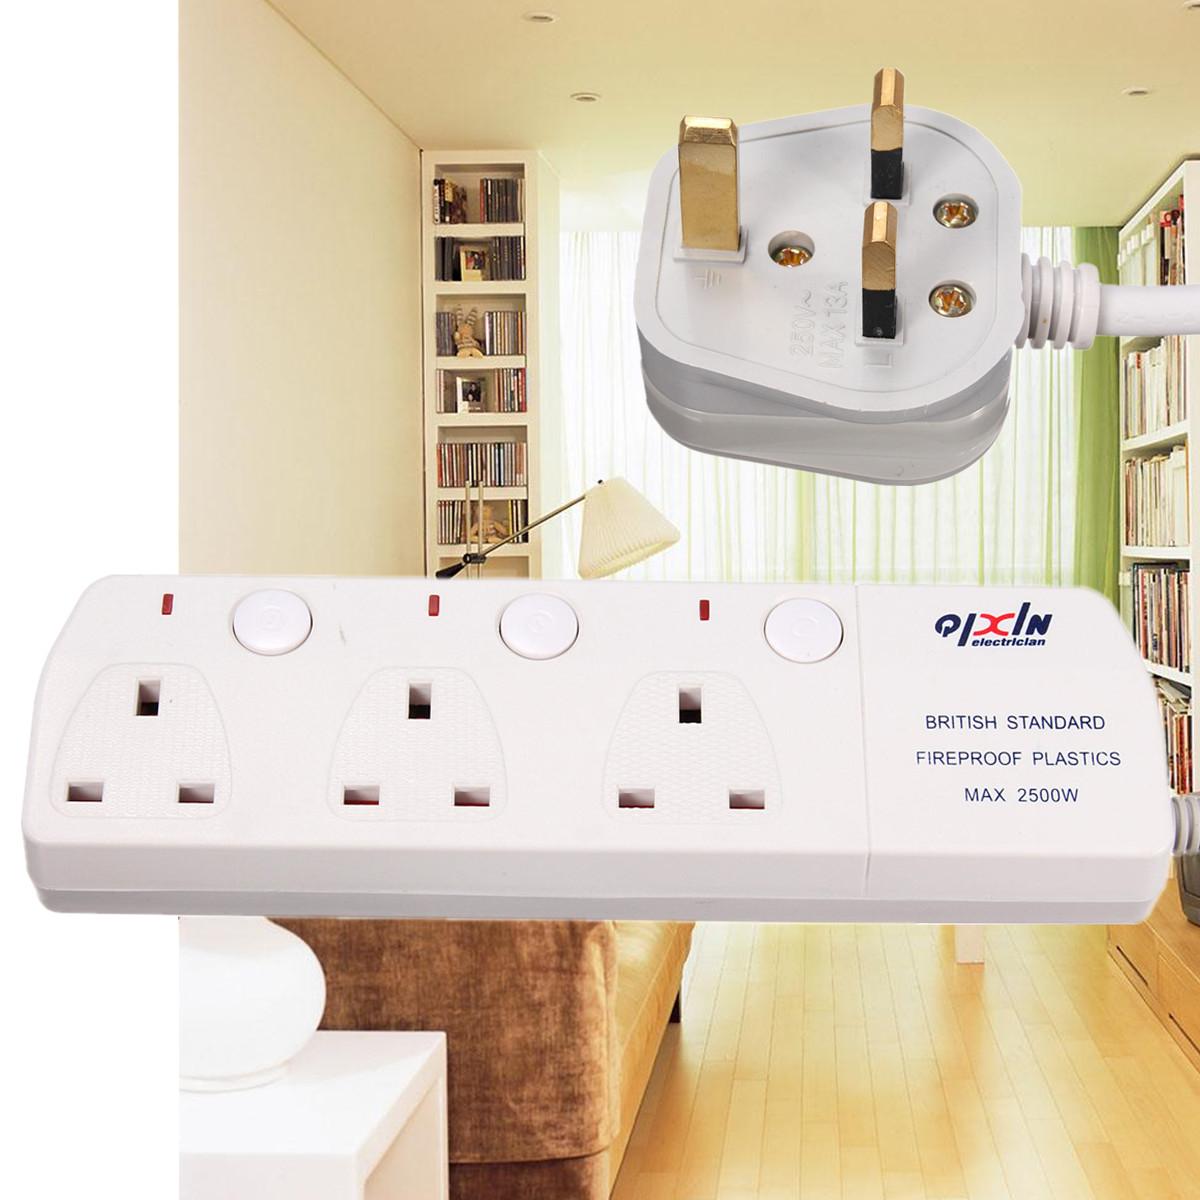 uk plug 3 outlet socket bloc prise electrique adaptateur extension cable switch ebay. Black Bedroom Furniture Sets. Home Design Ideas